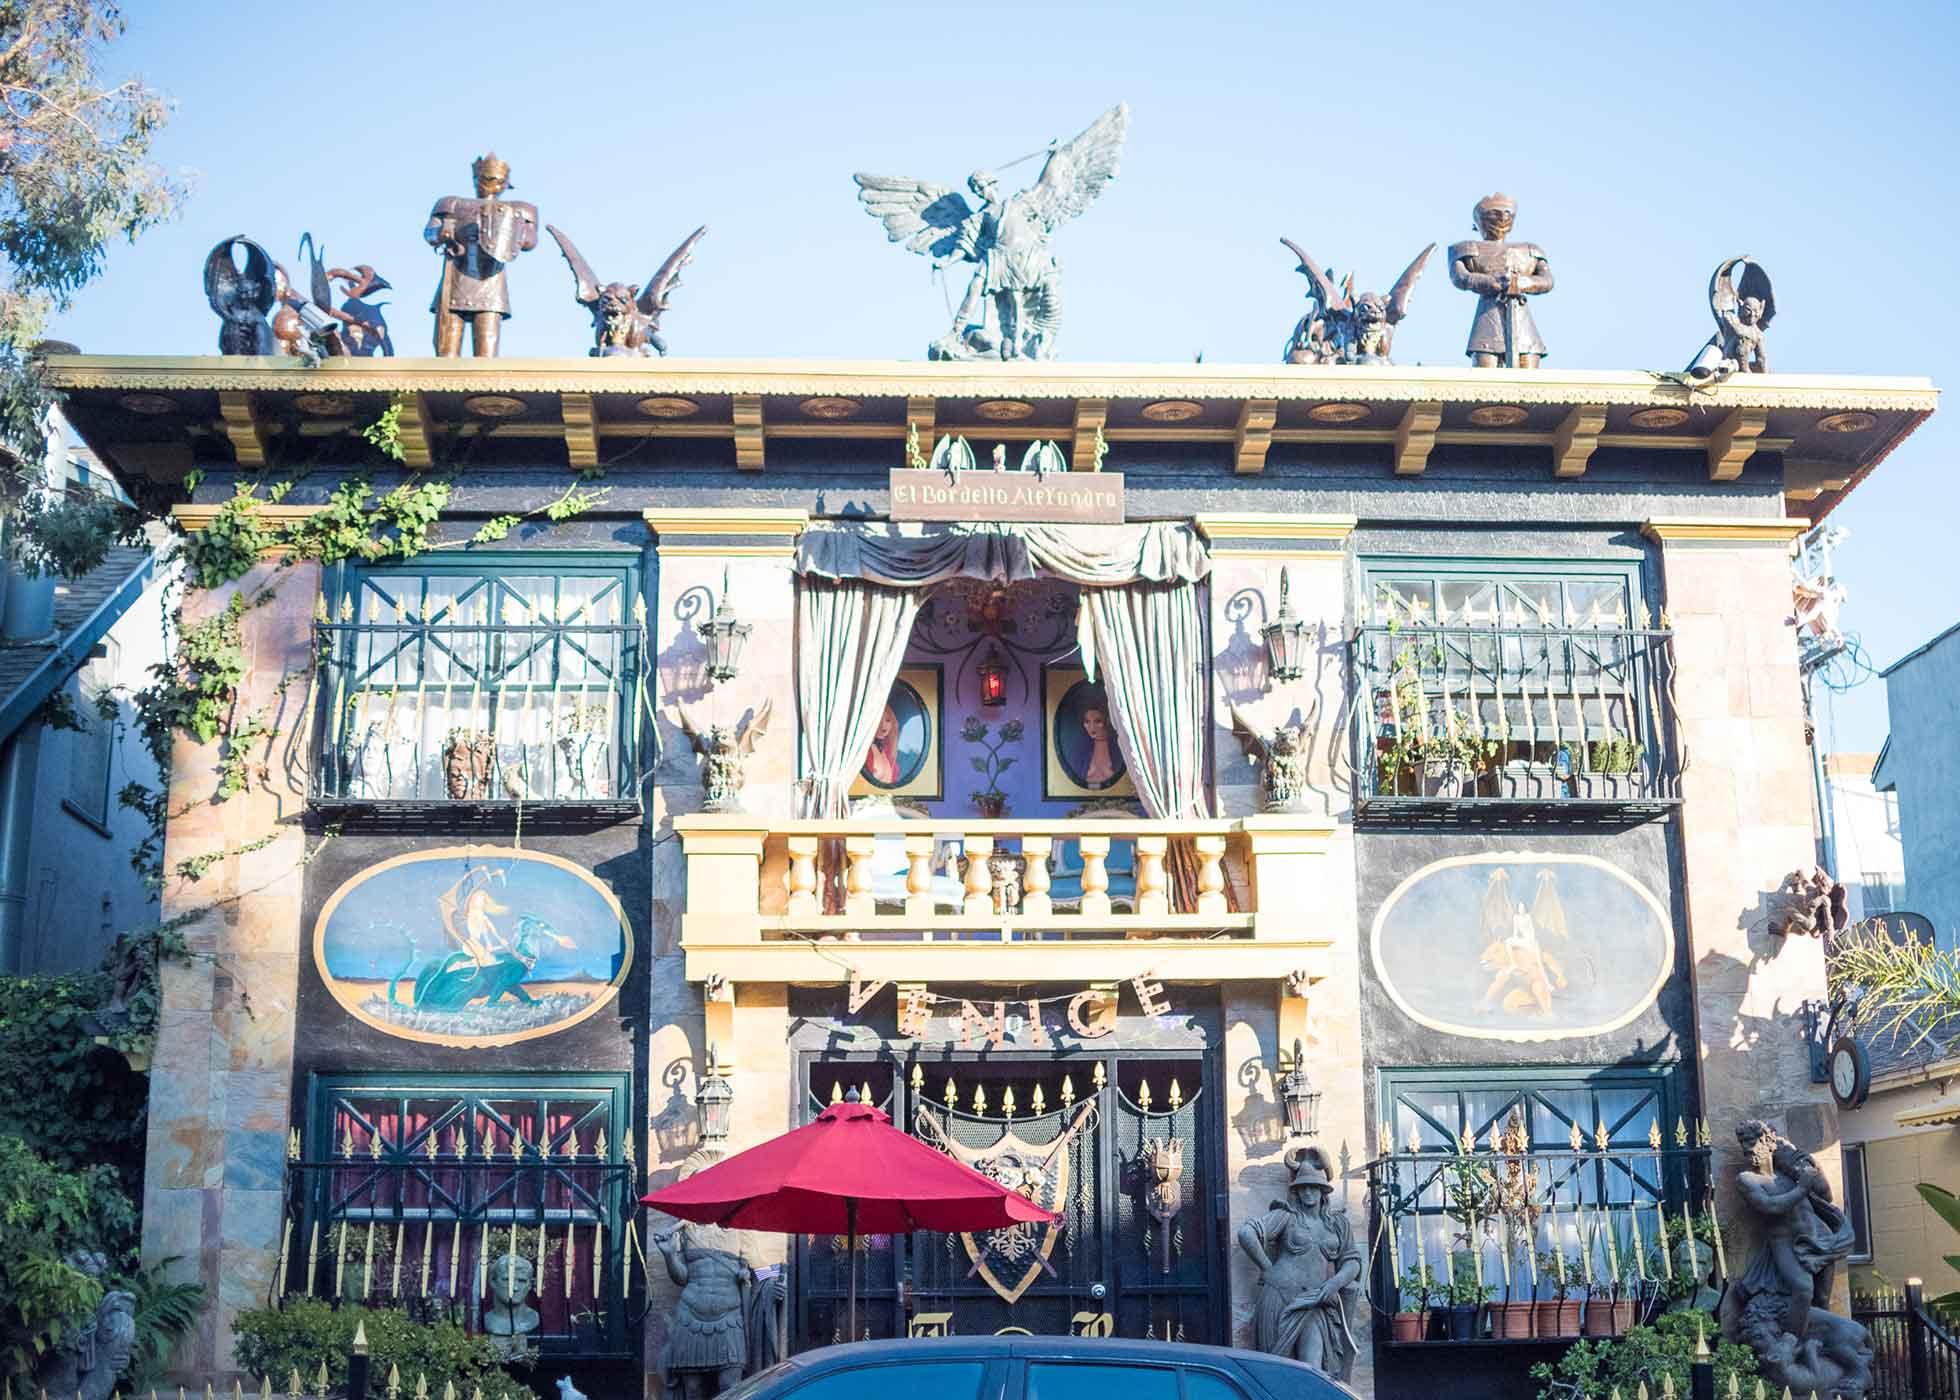 sml-Venice-Adventure-2015-29.jpg